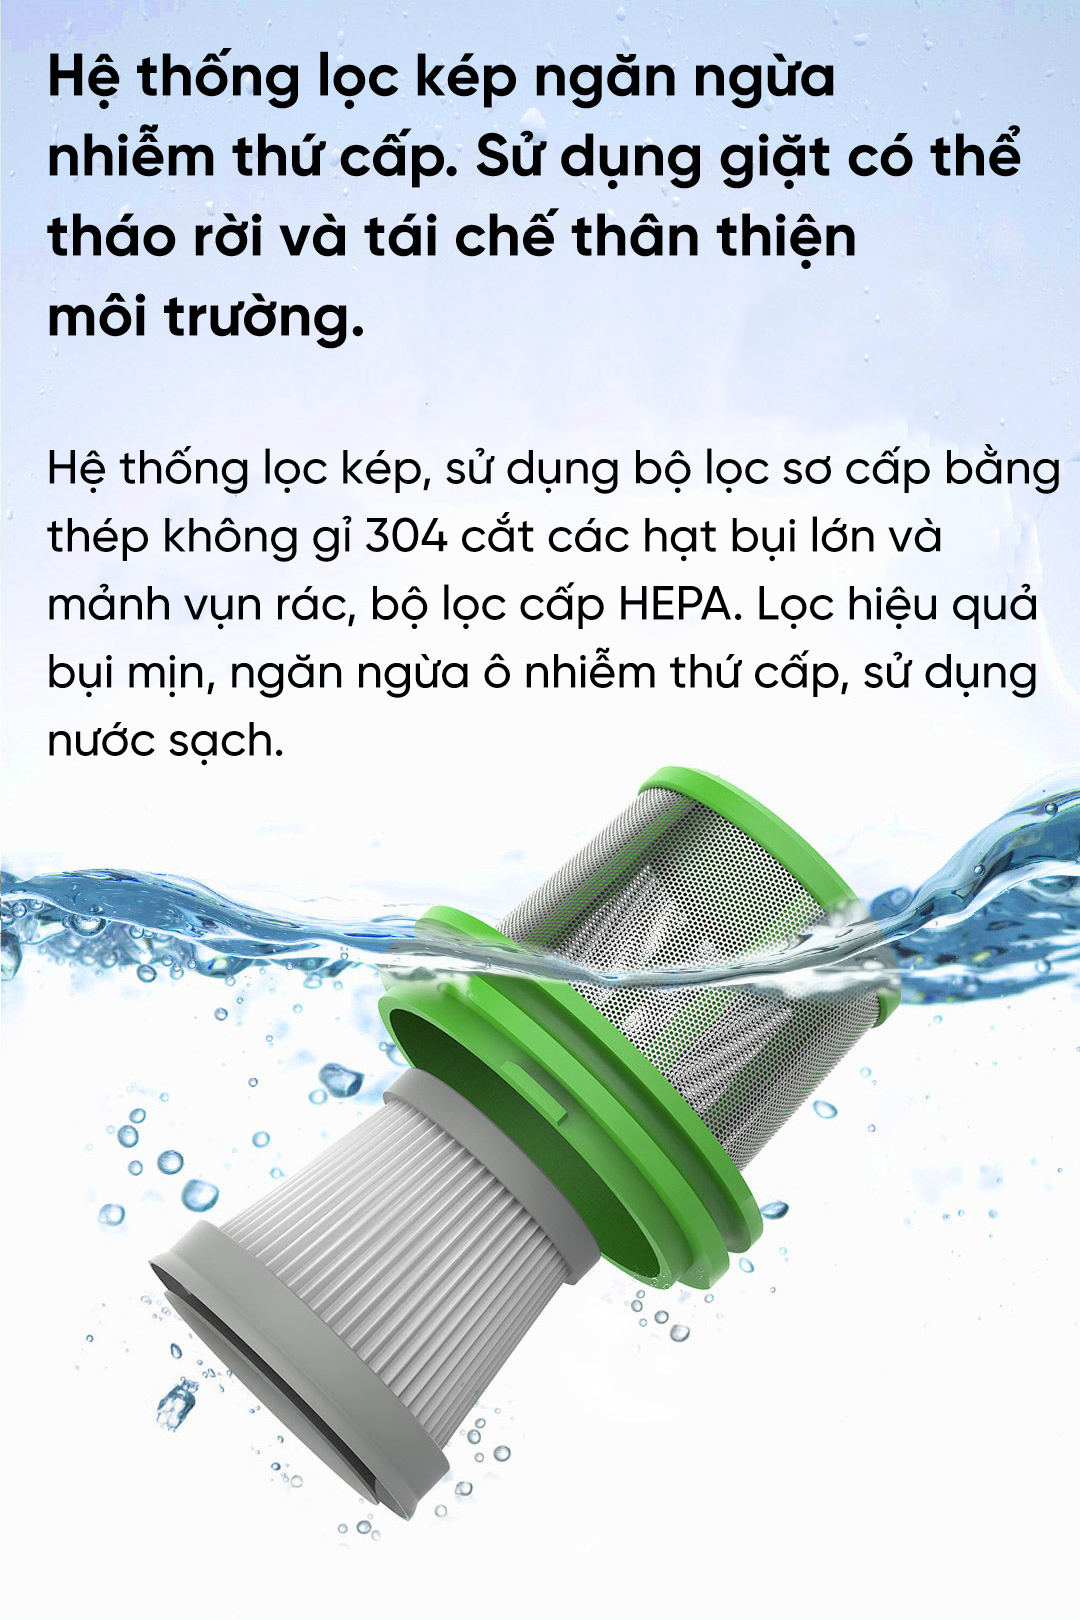 may-hut-bui-cam-tay-qingting-h2-fv2-07